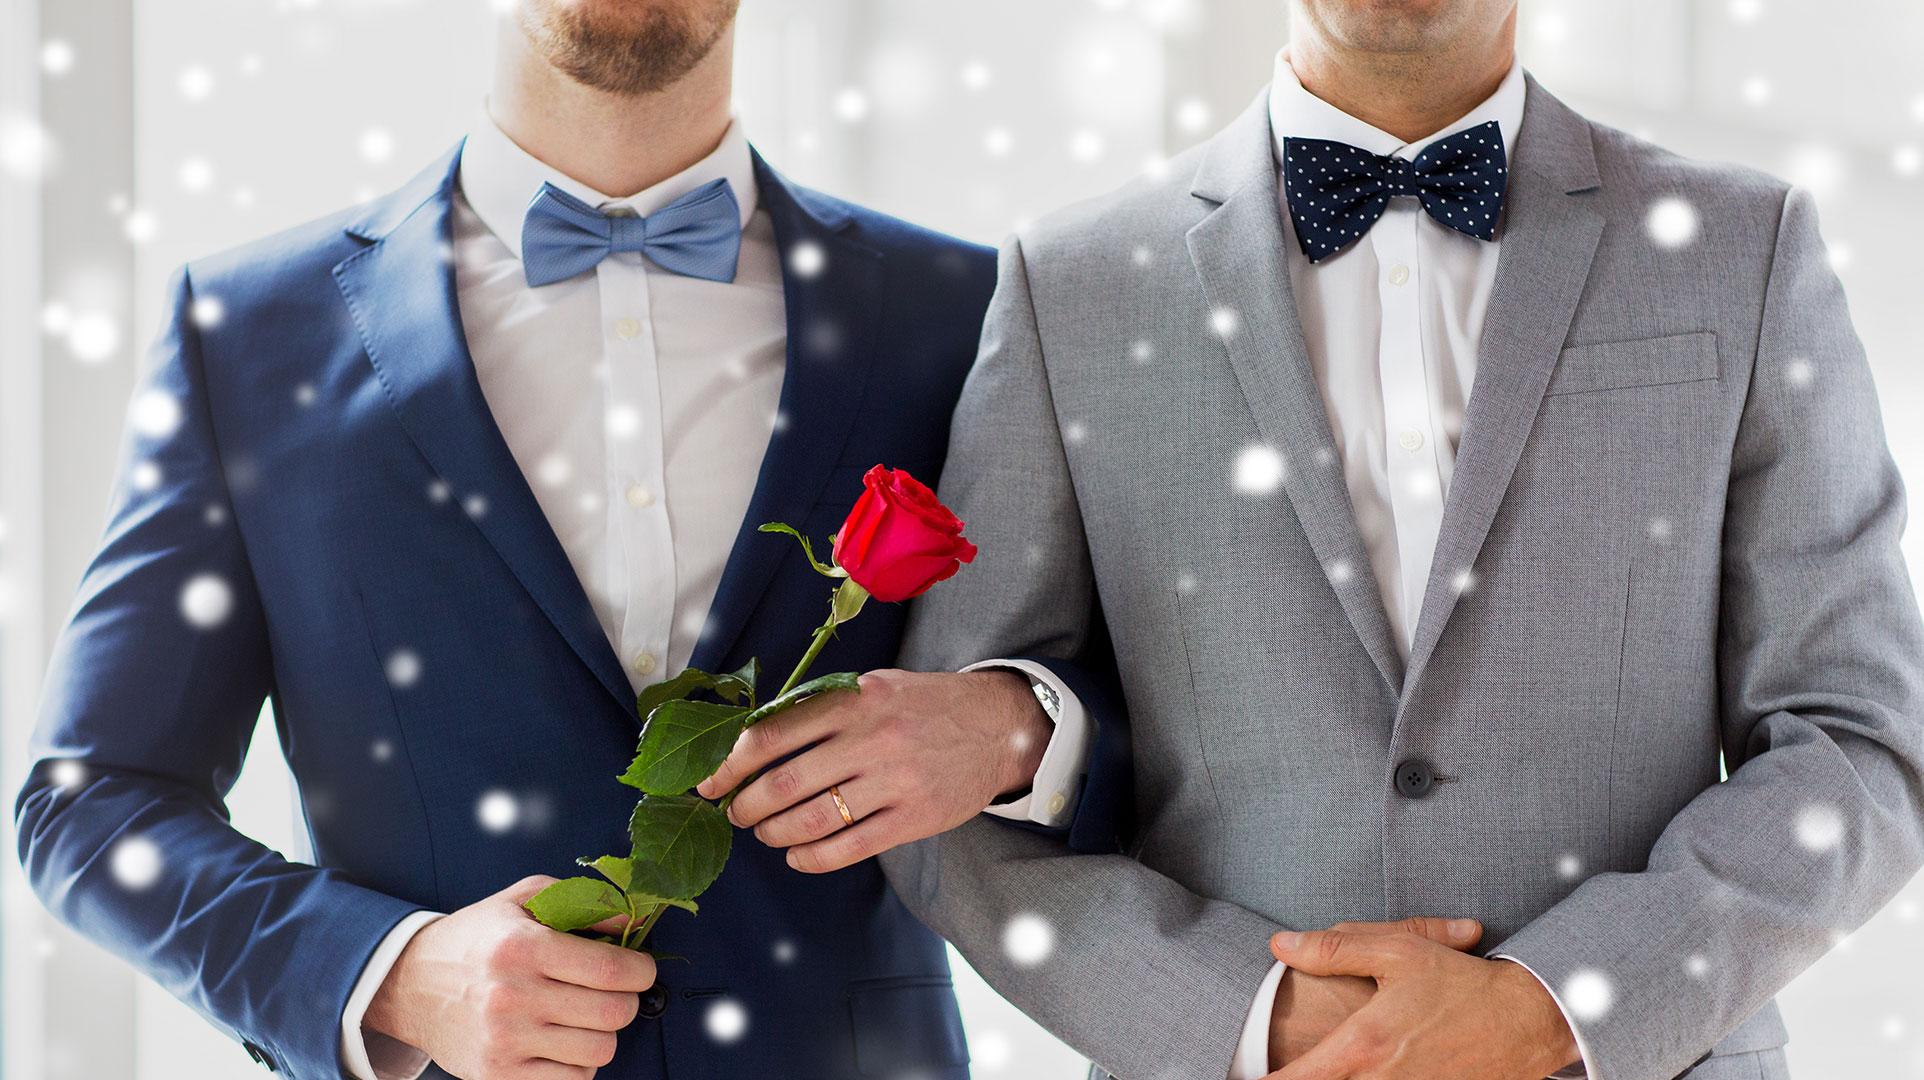 Matrimonio Simbolico Chile : Gobierno lanza web para sensibilizar sobre el matrimonio igualitario